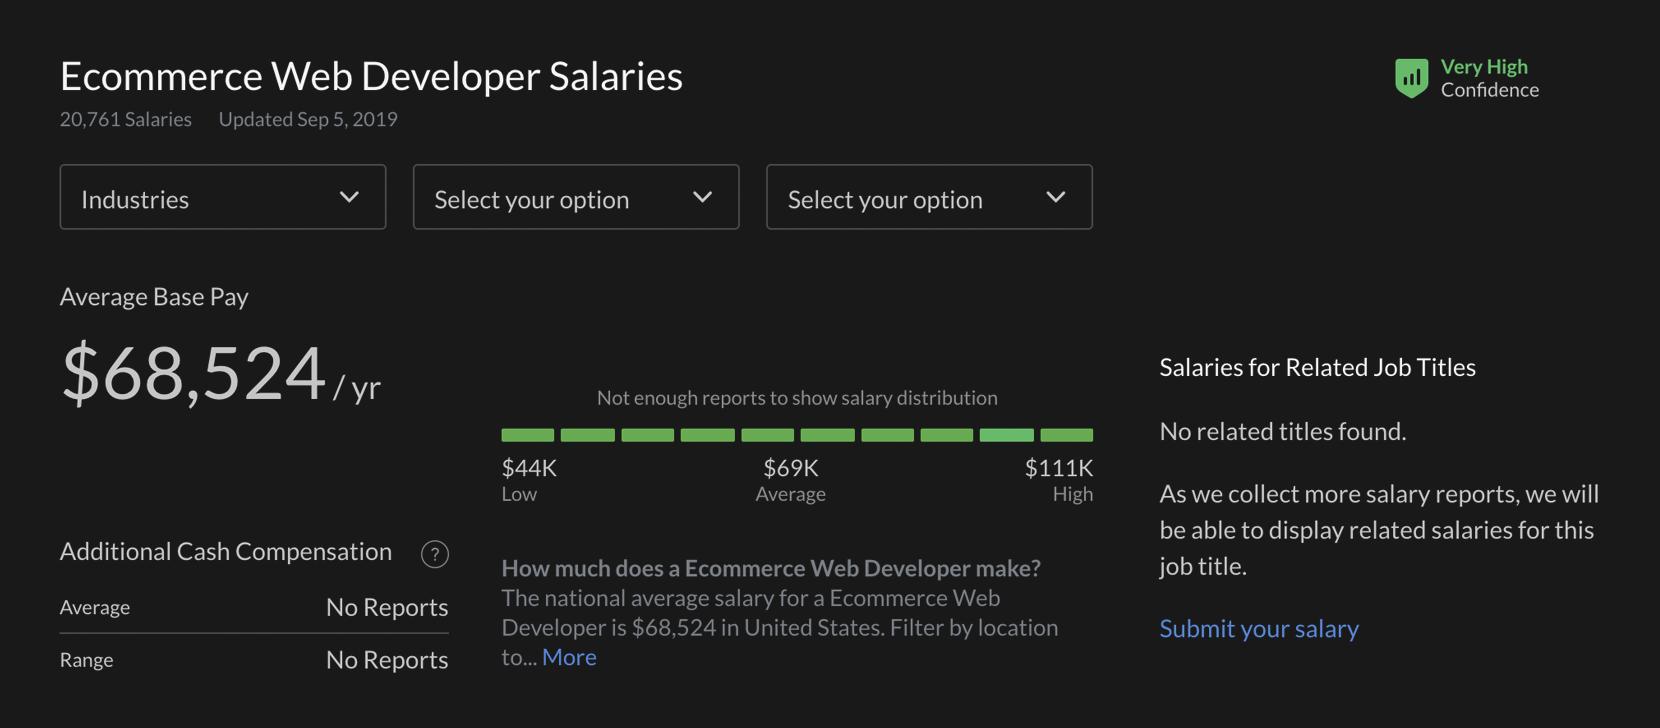 ecommerce web developer wage